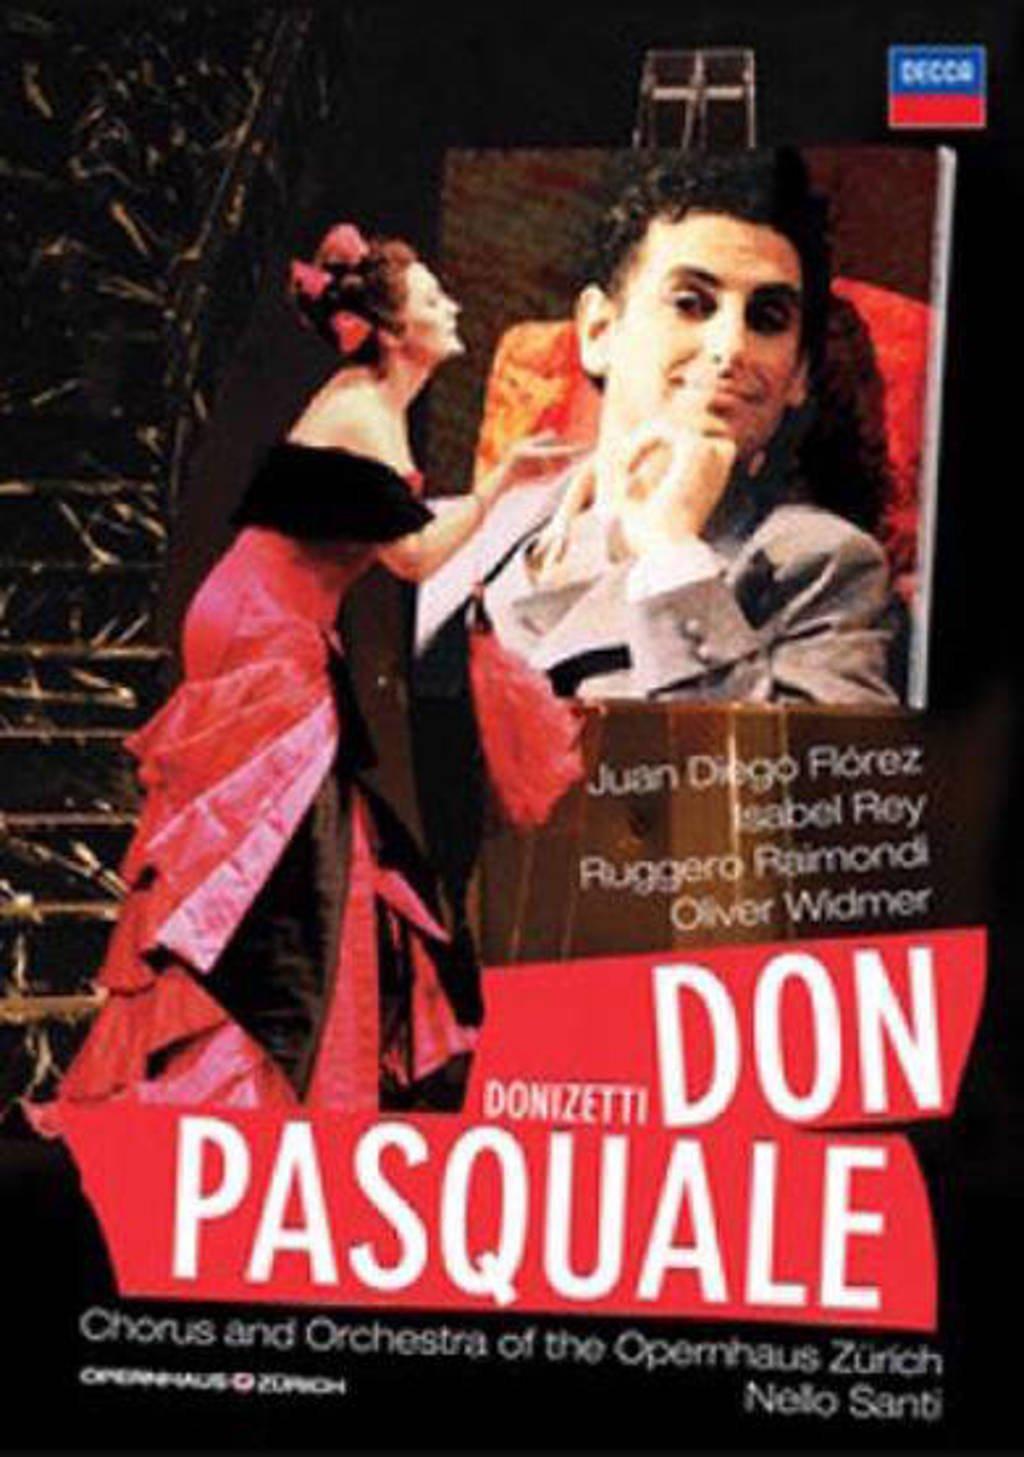 Don pasquale (DVD)